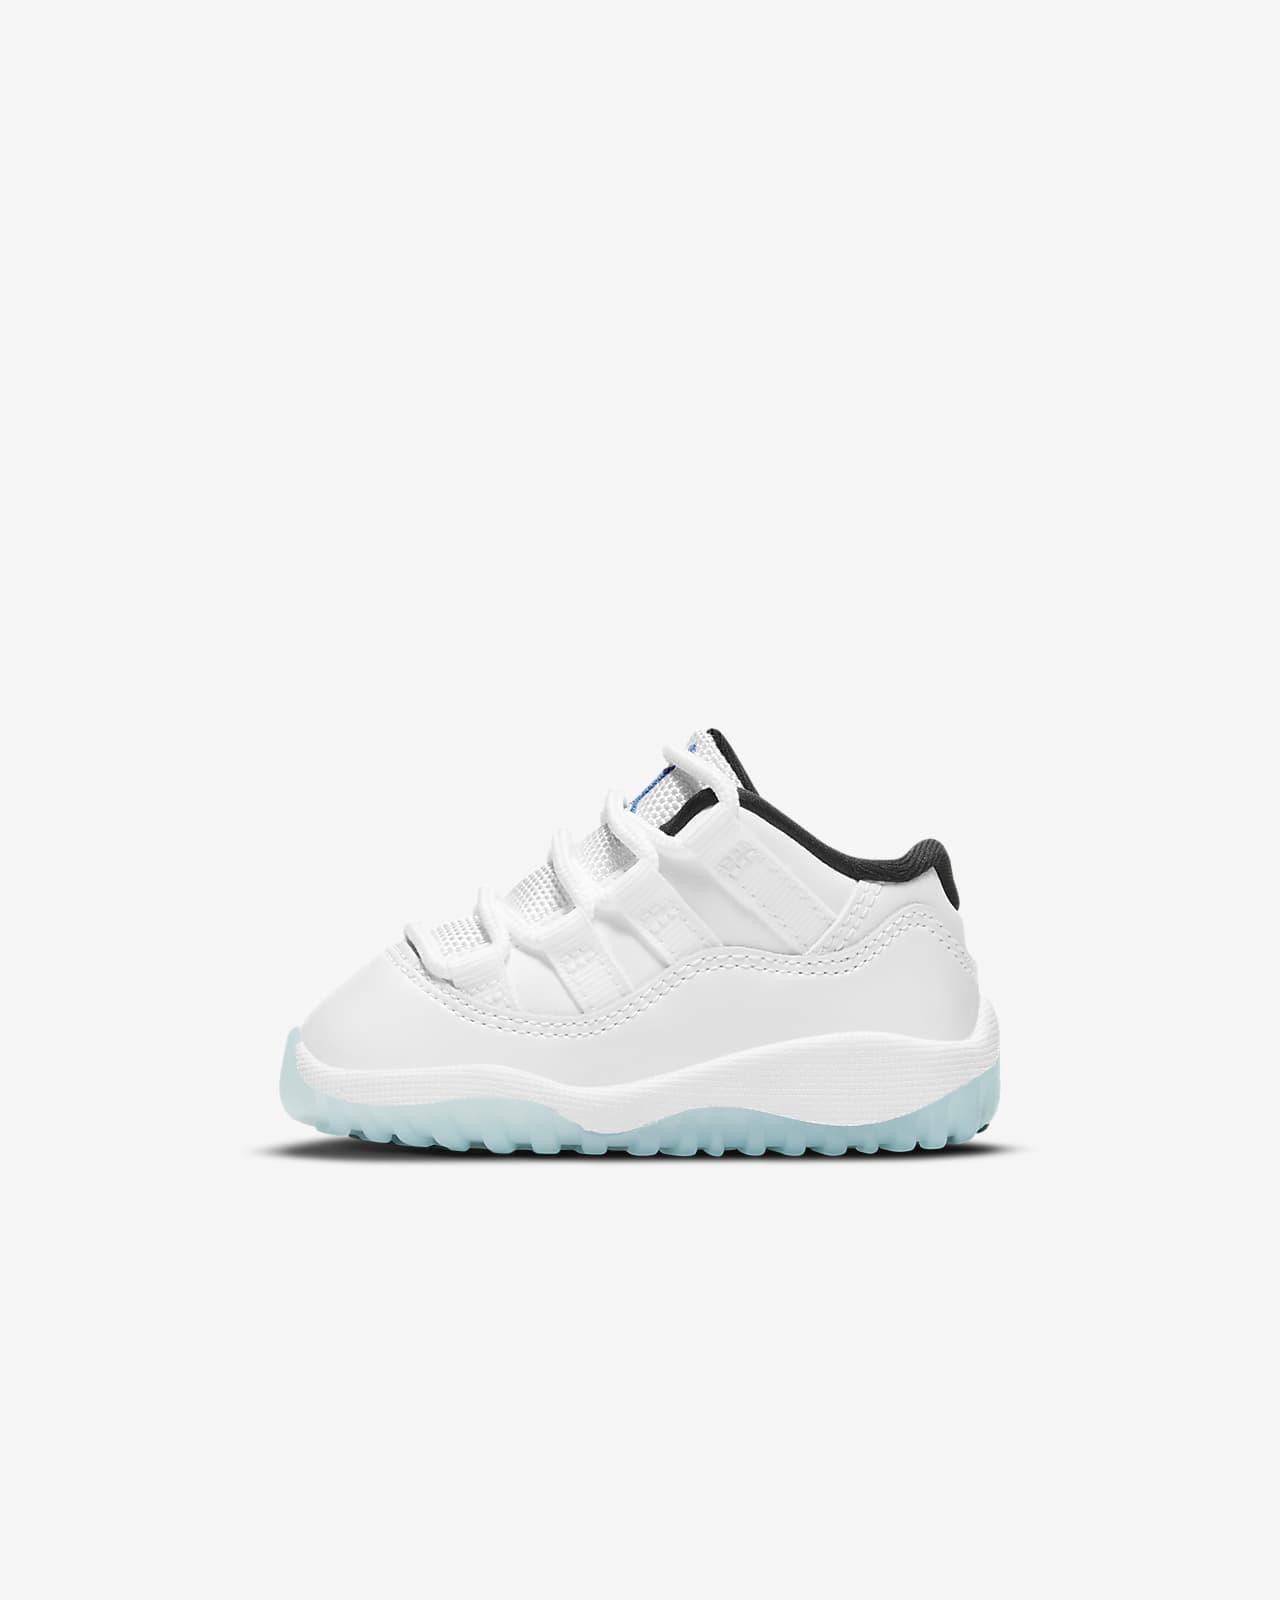 Air Jordan 11 Retro Low Baby/Toddler Shoe